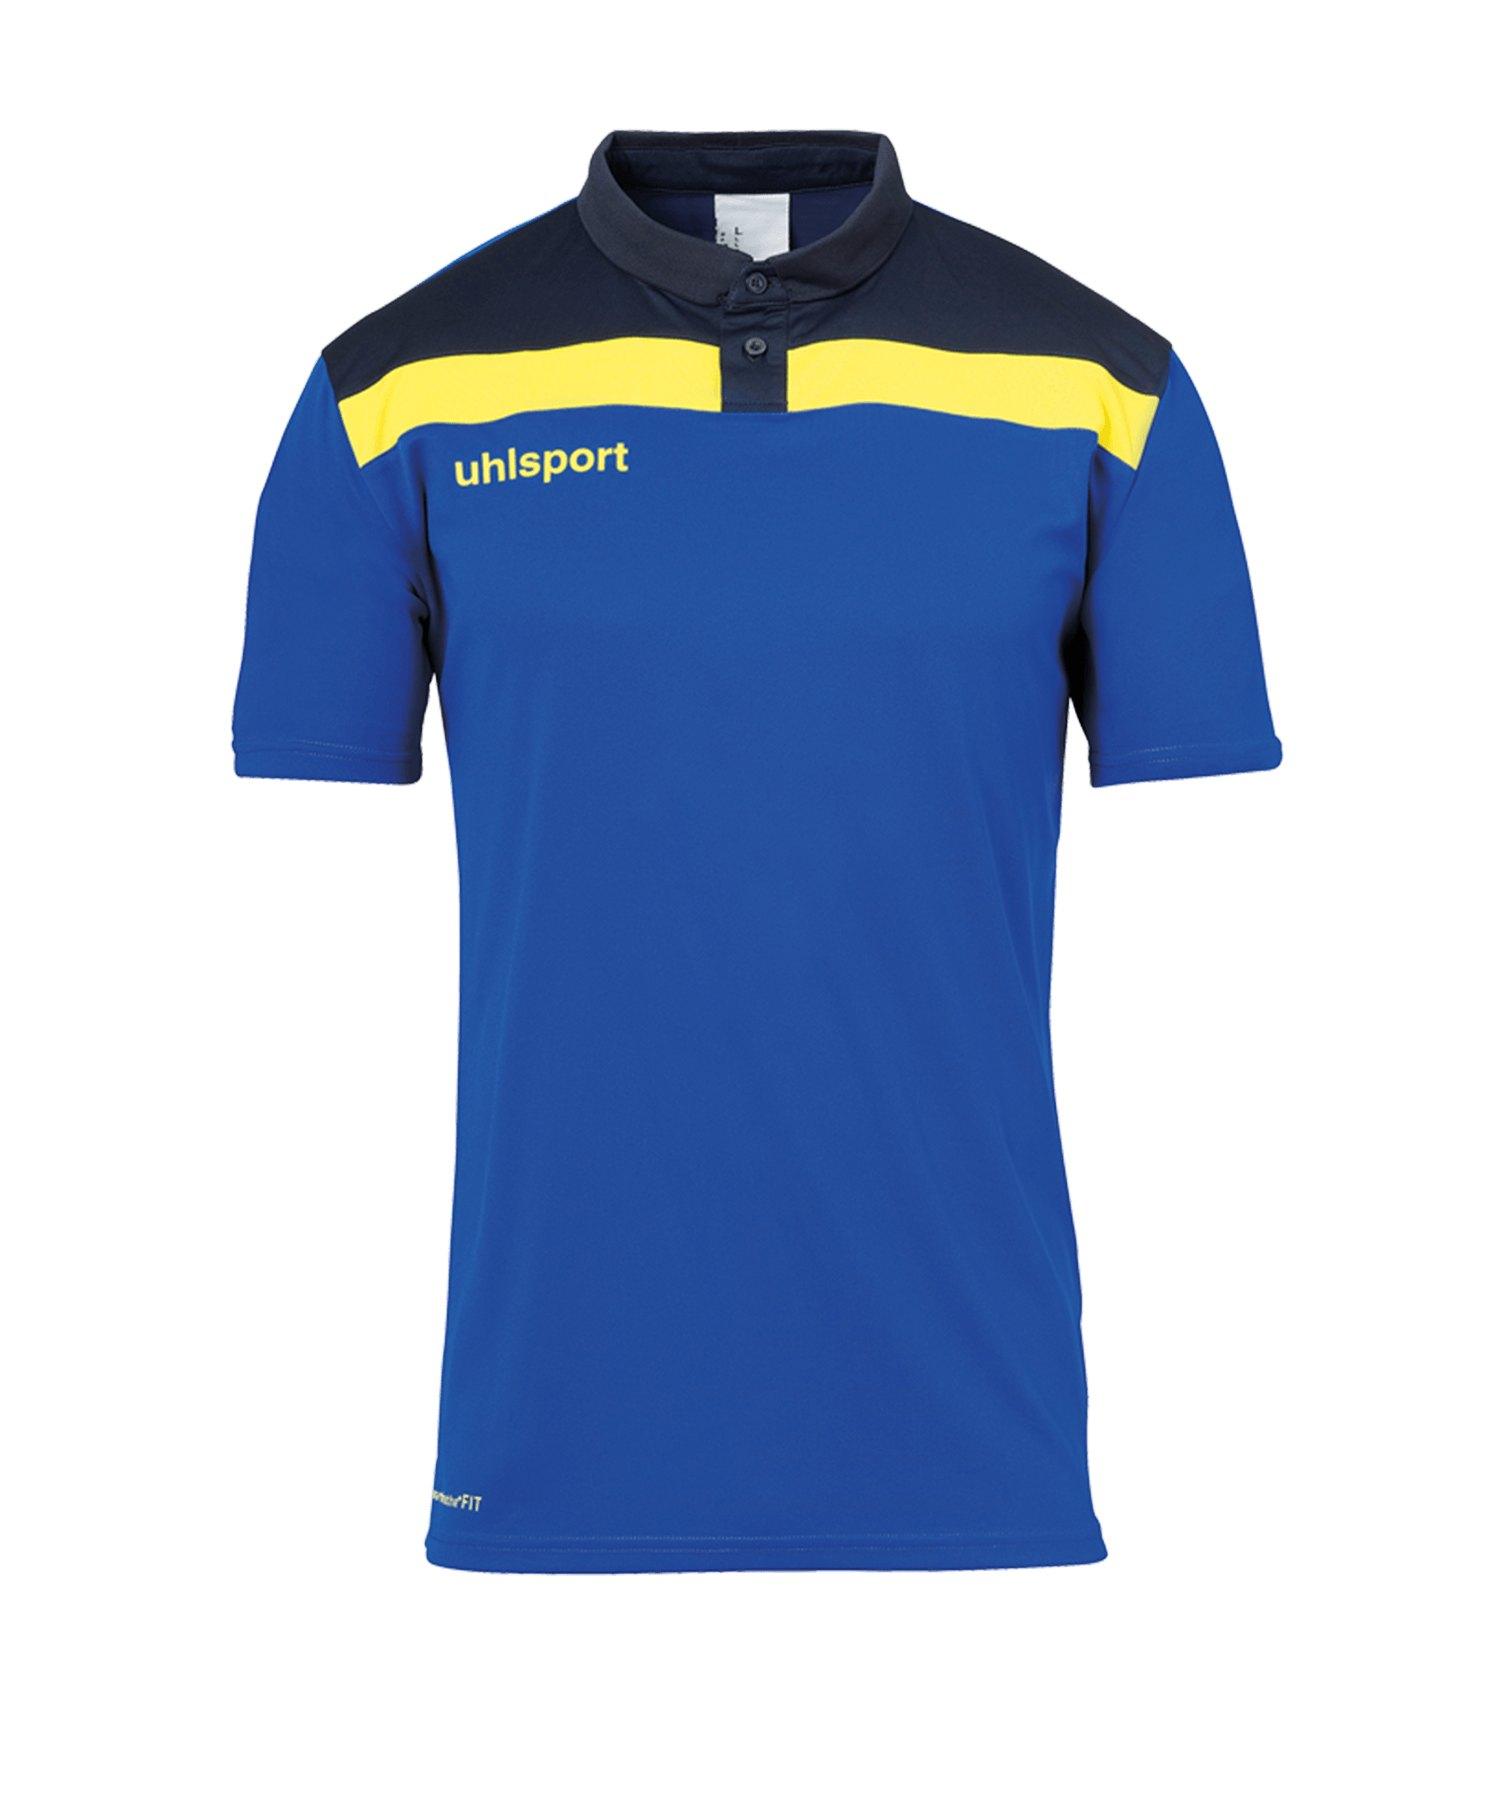 Uhlsport Offense 23 Poloshirt Blau F14 - blau